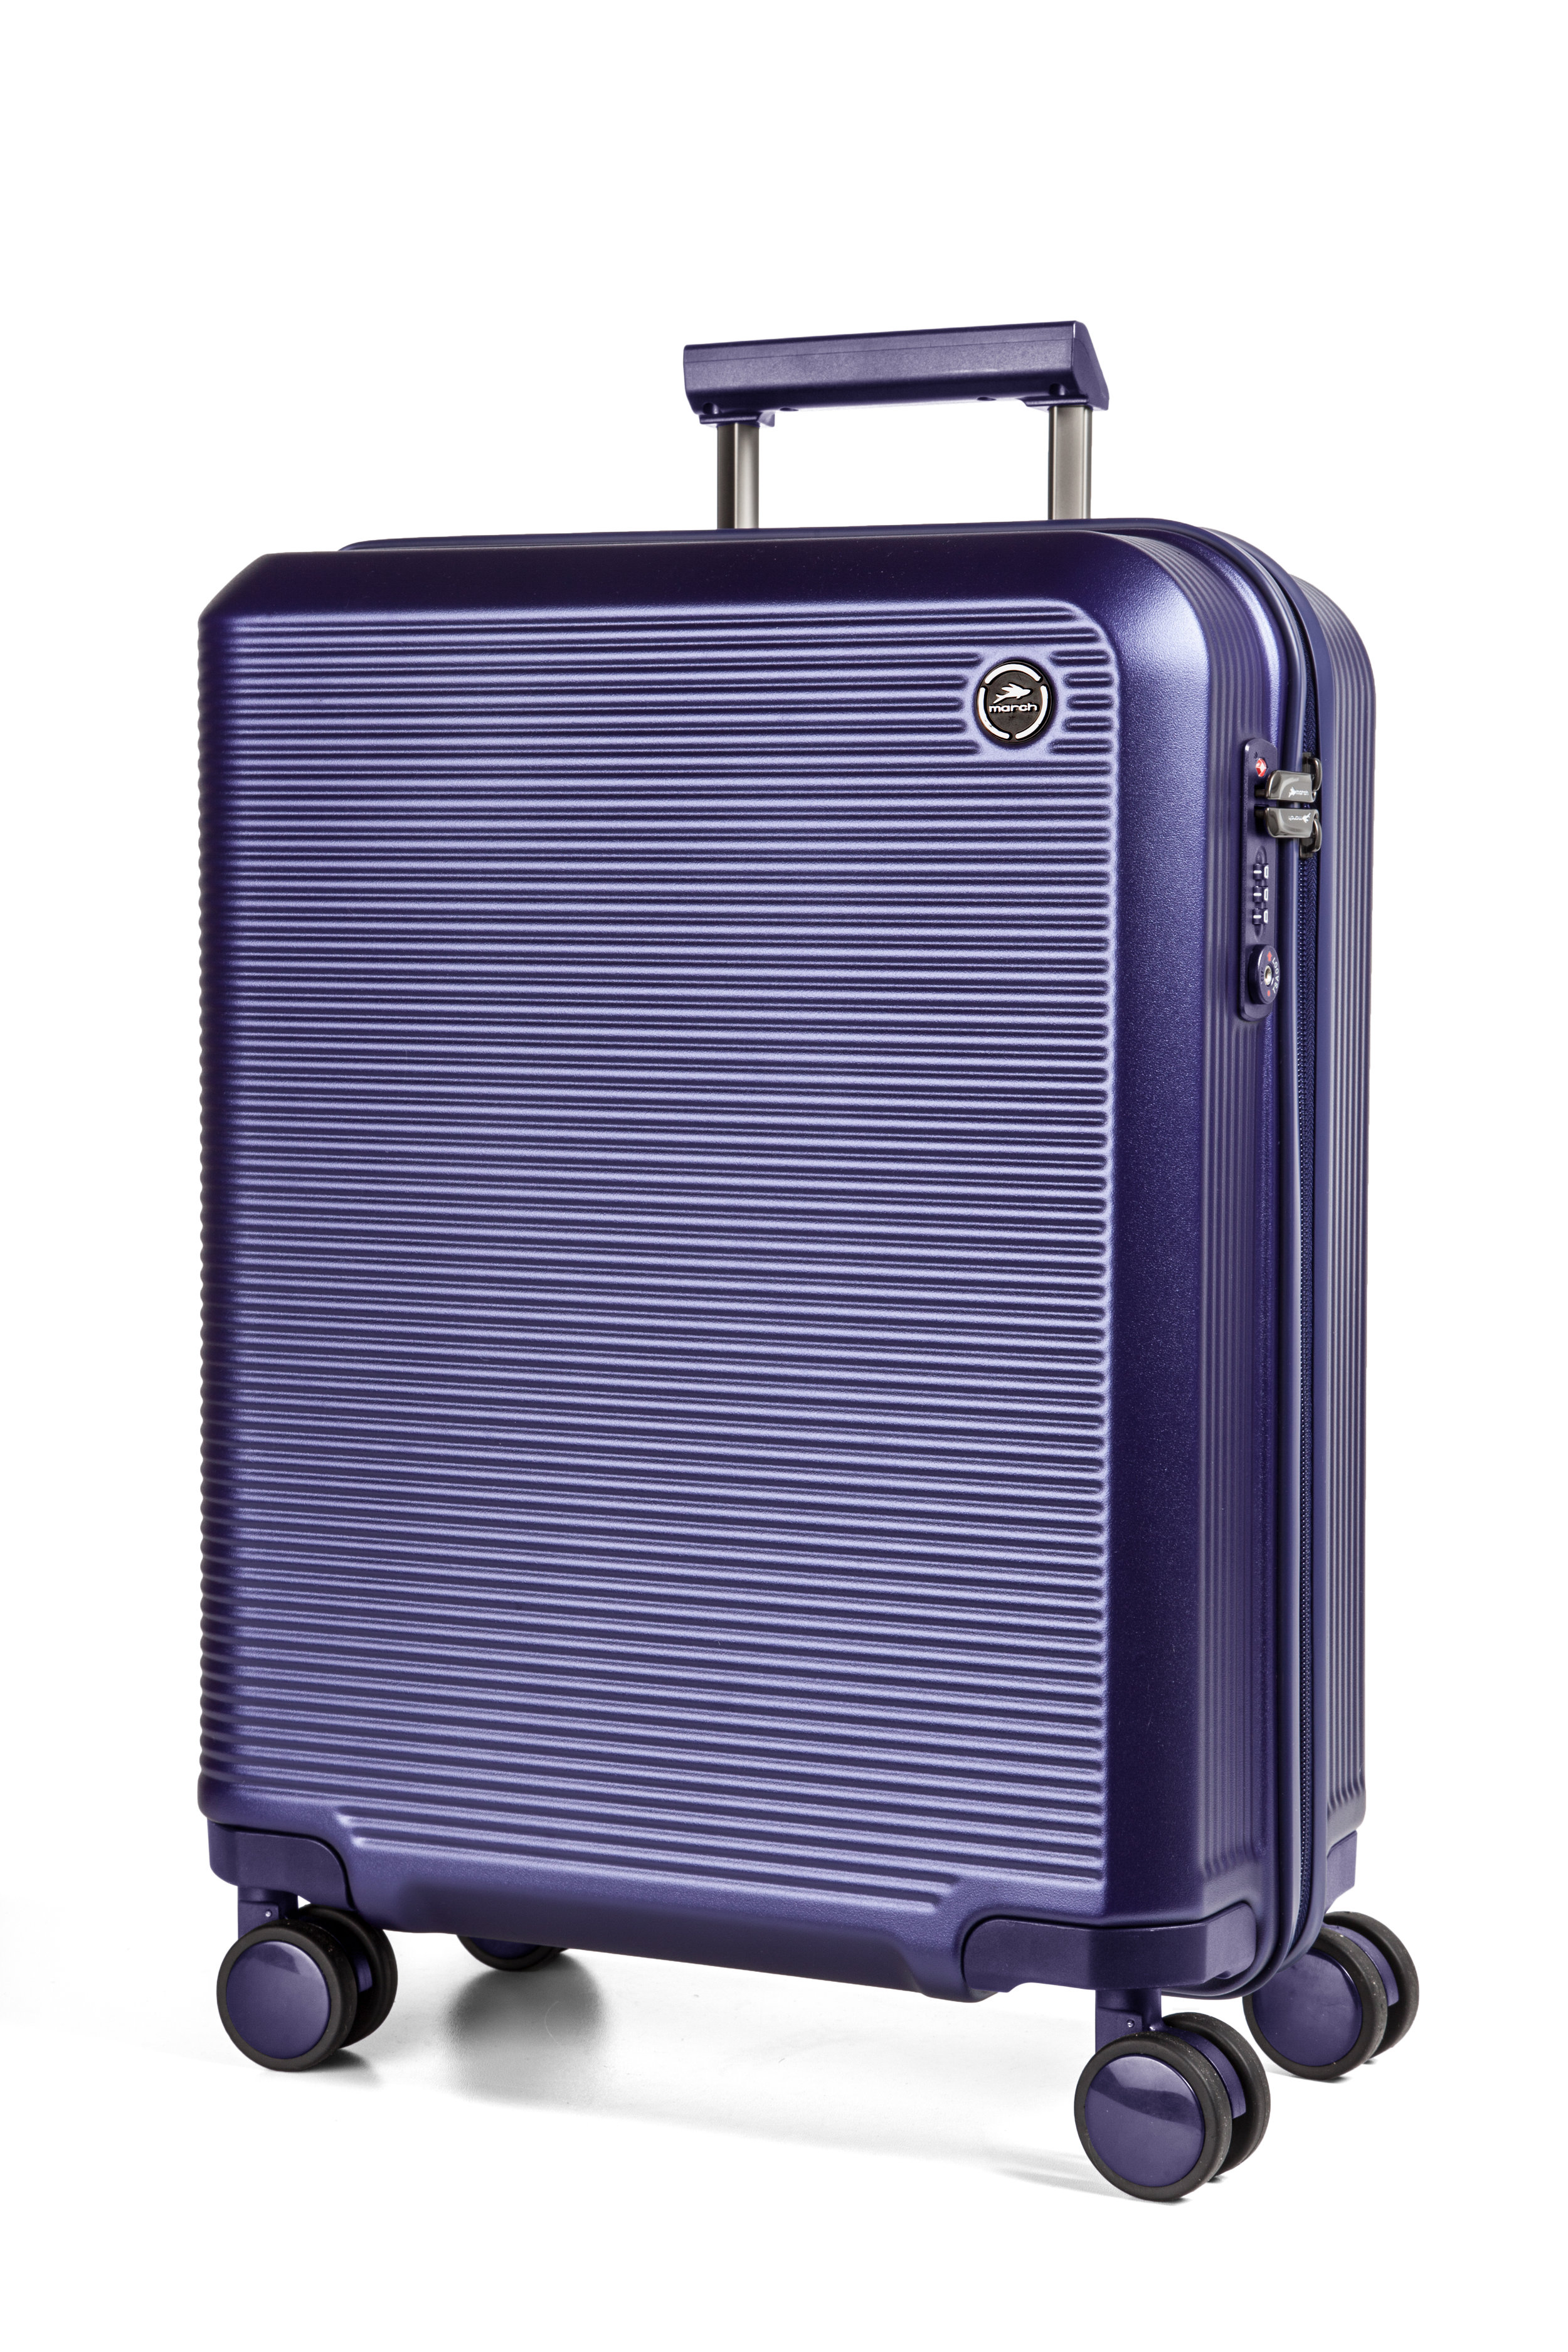 ODESSA purple.jpg